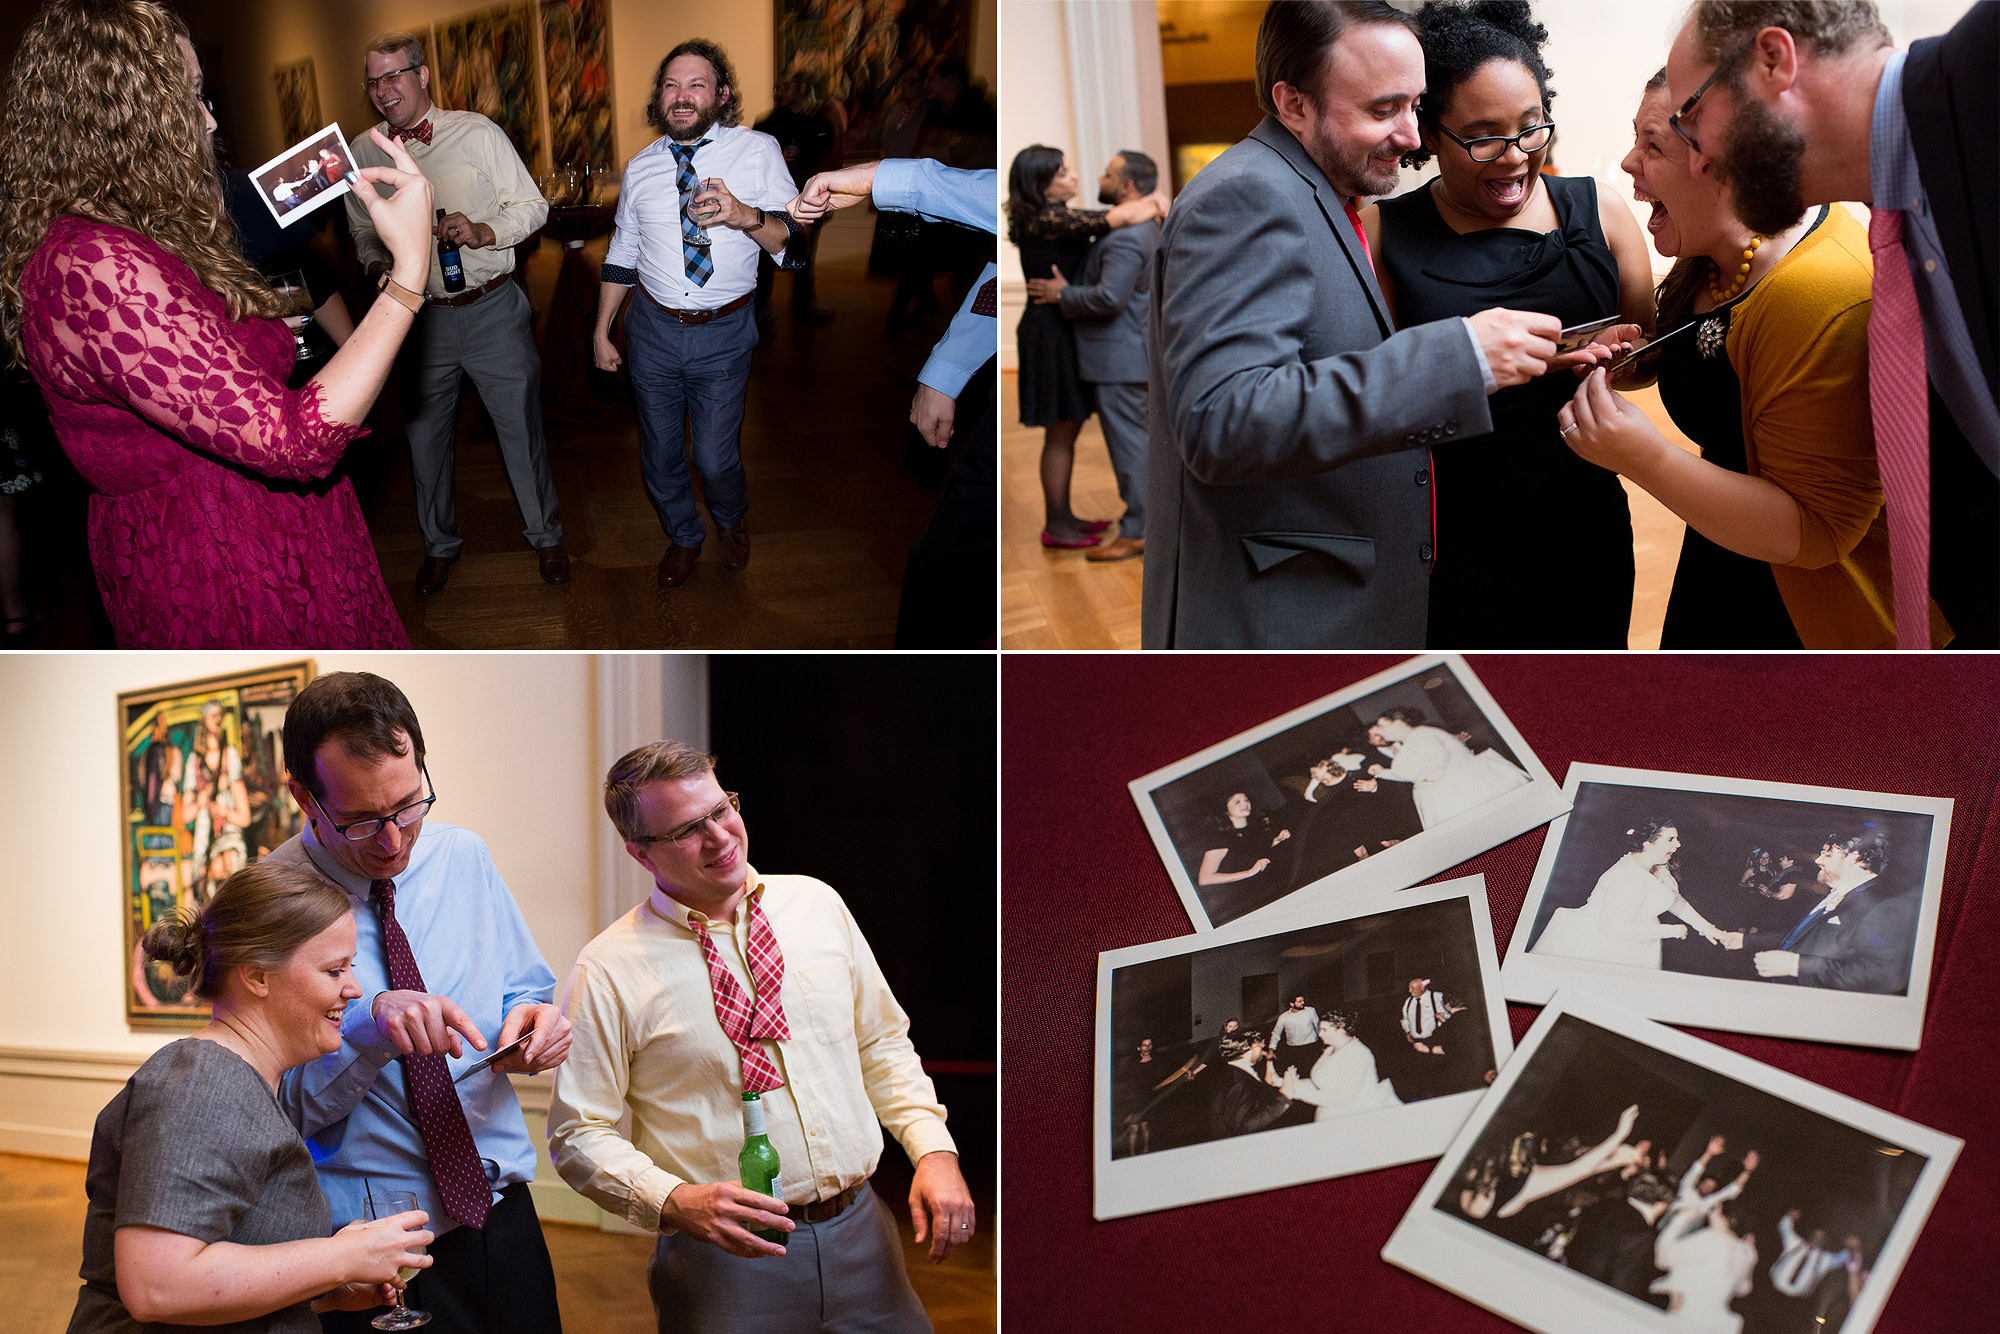 P_20-st-louis-art-history-museum-wedding-guests-polaroids.jpg